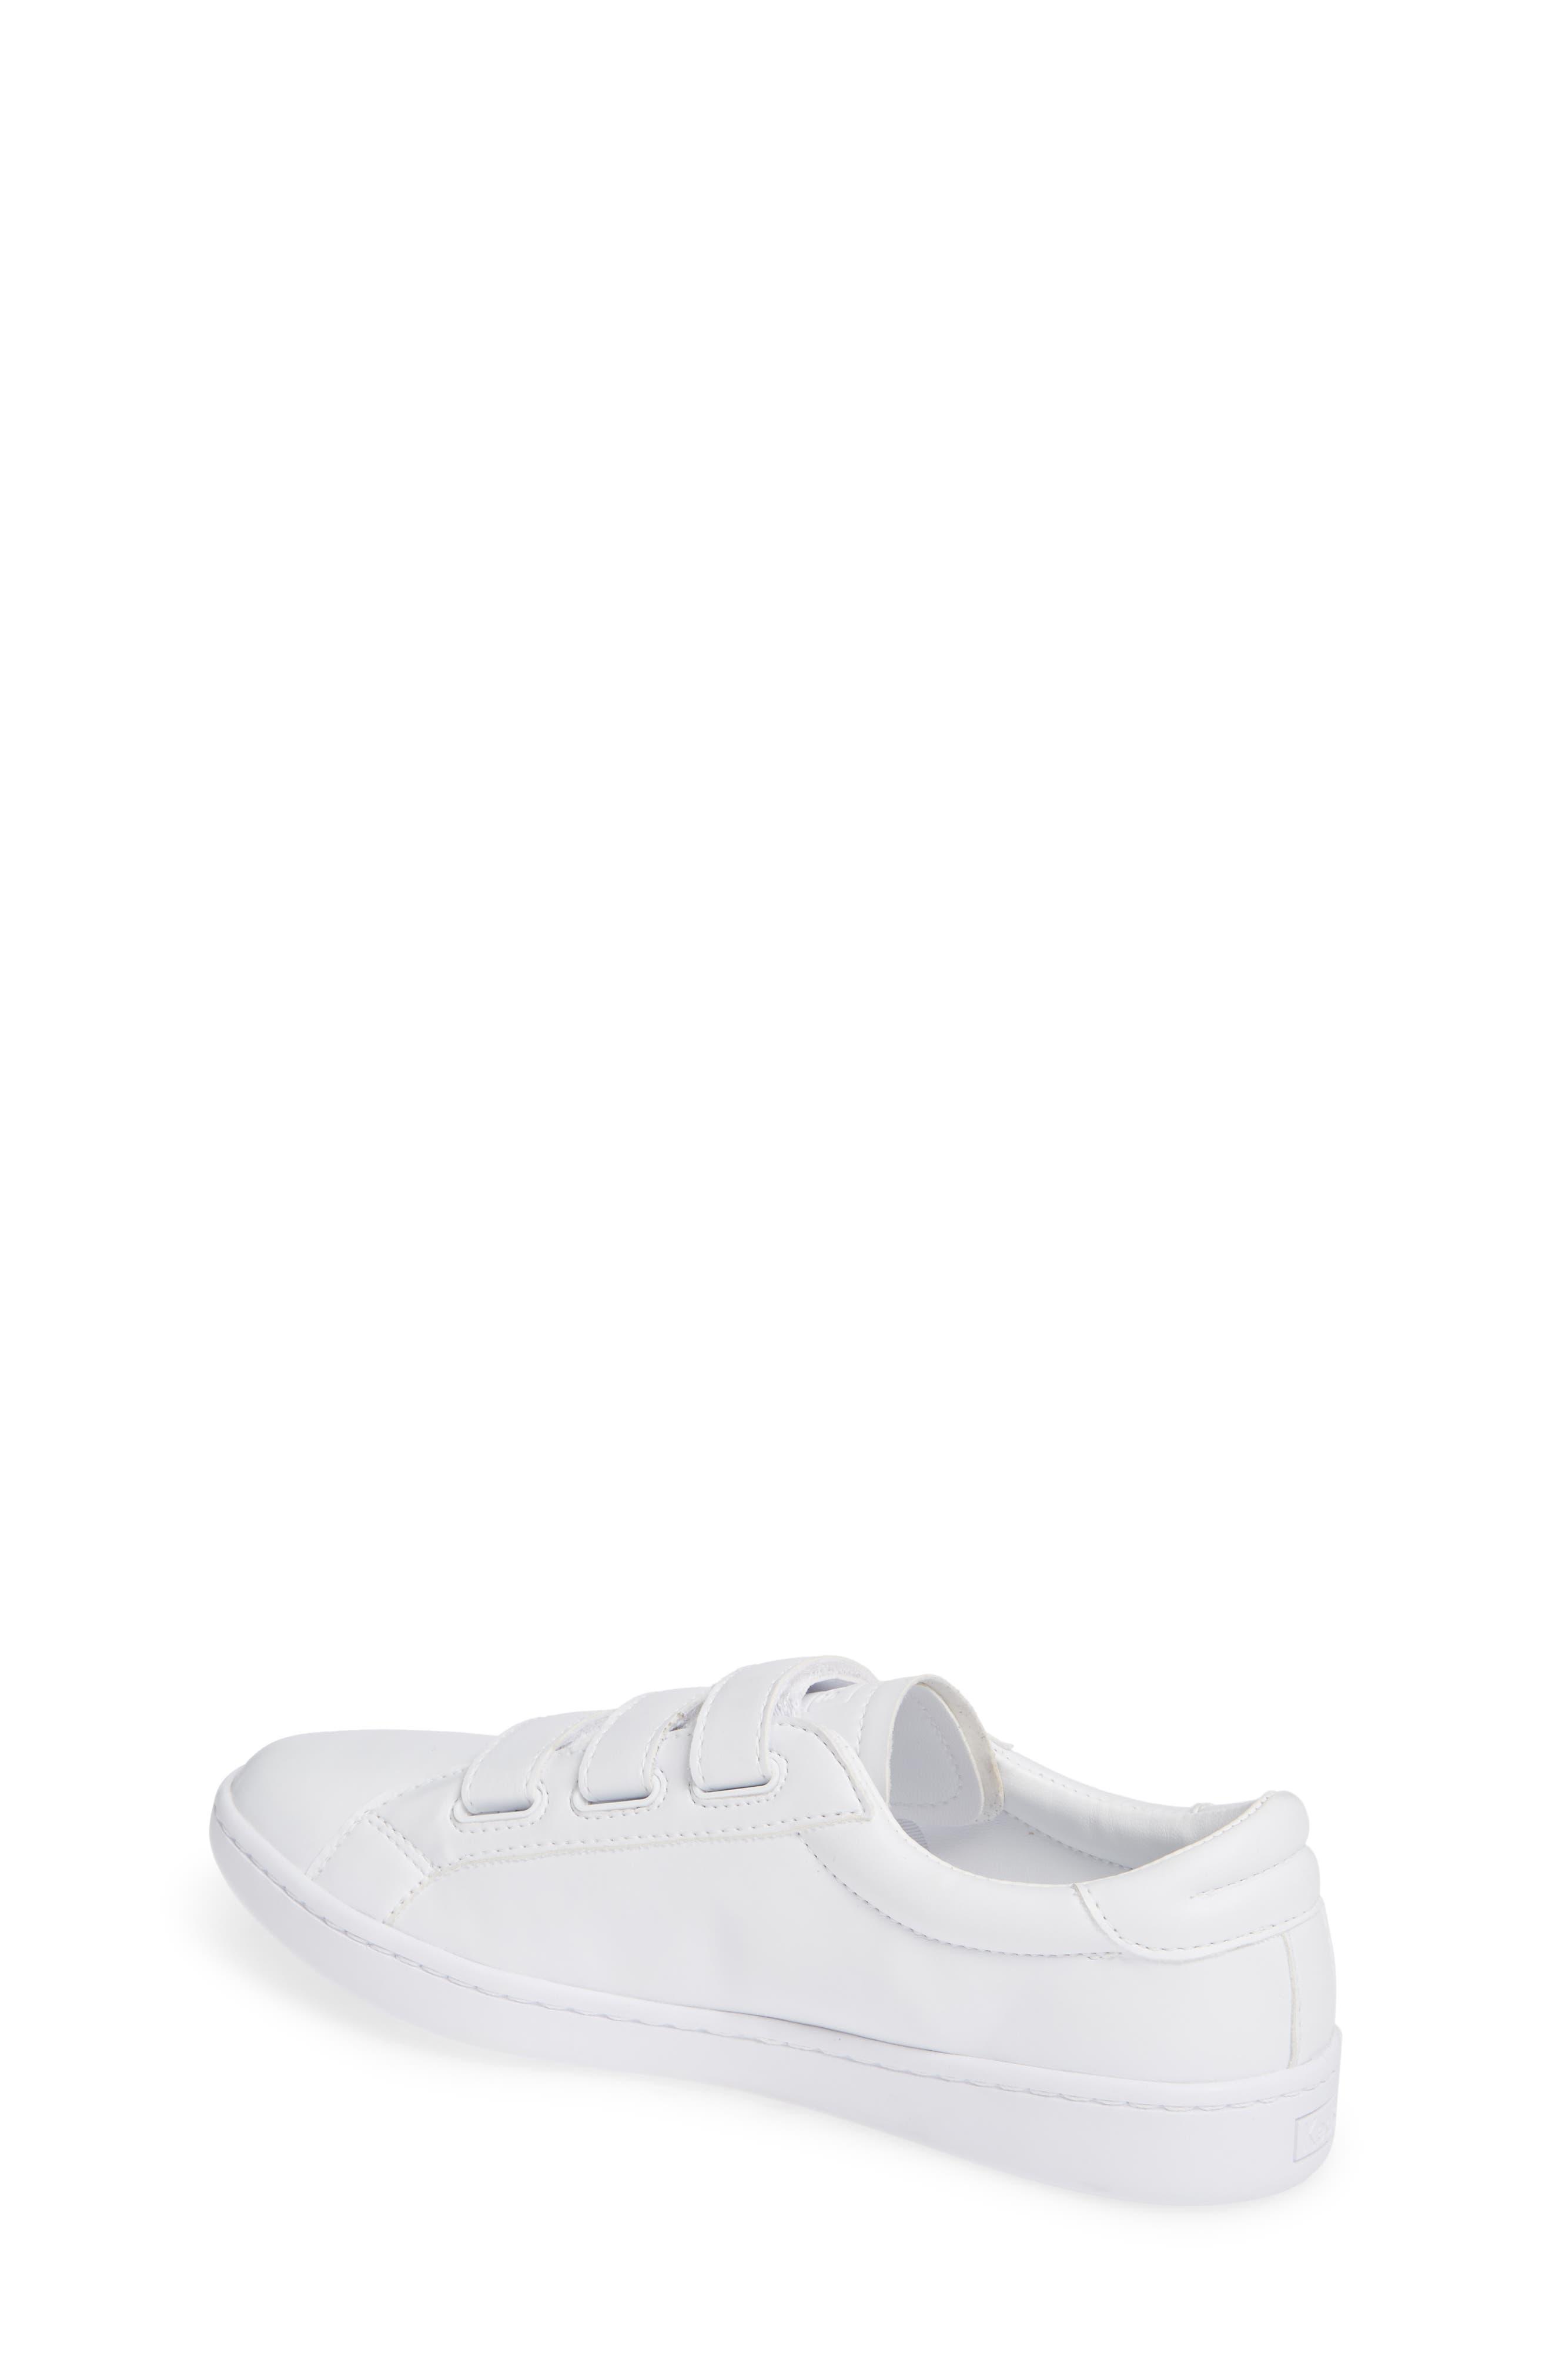 KEDS<SUP>®</SUP>, Ace 3V Sneaker, Alternate thumbnail 2, color, 100